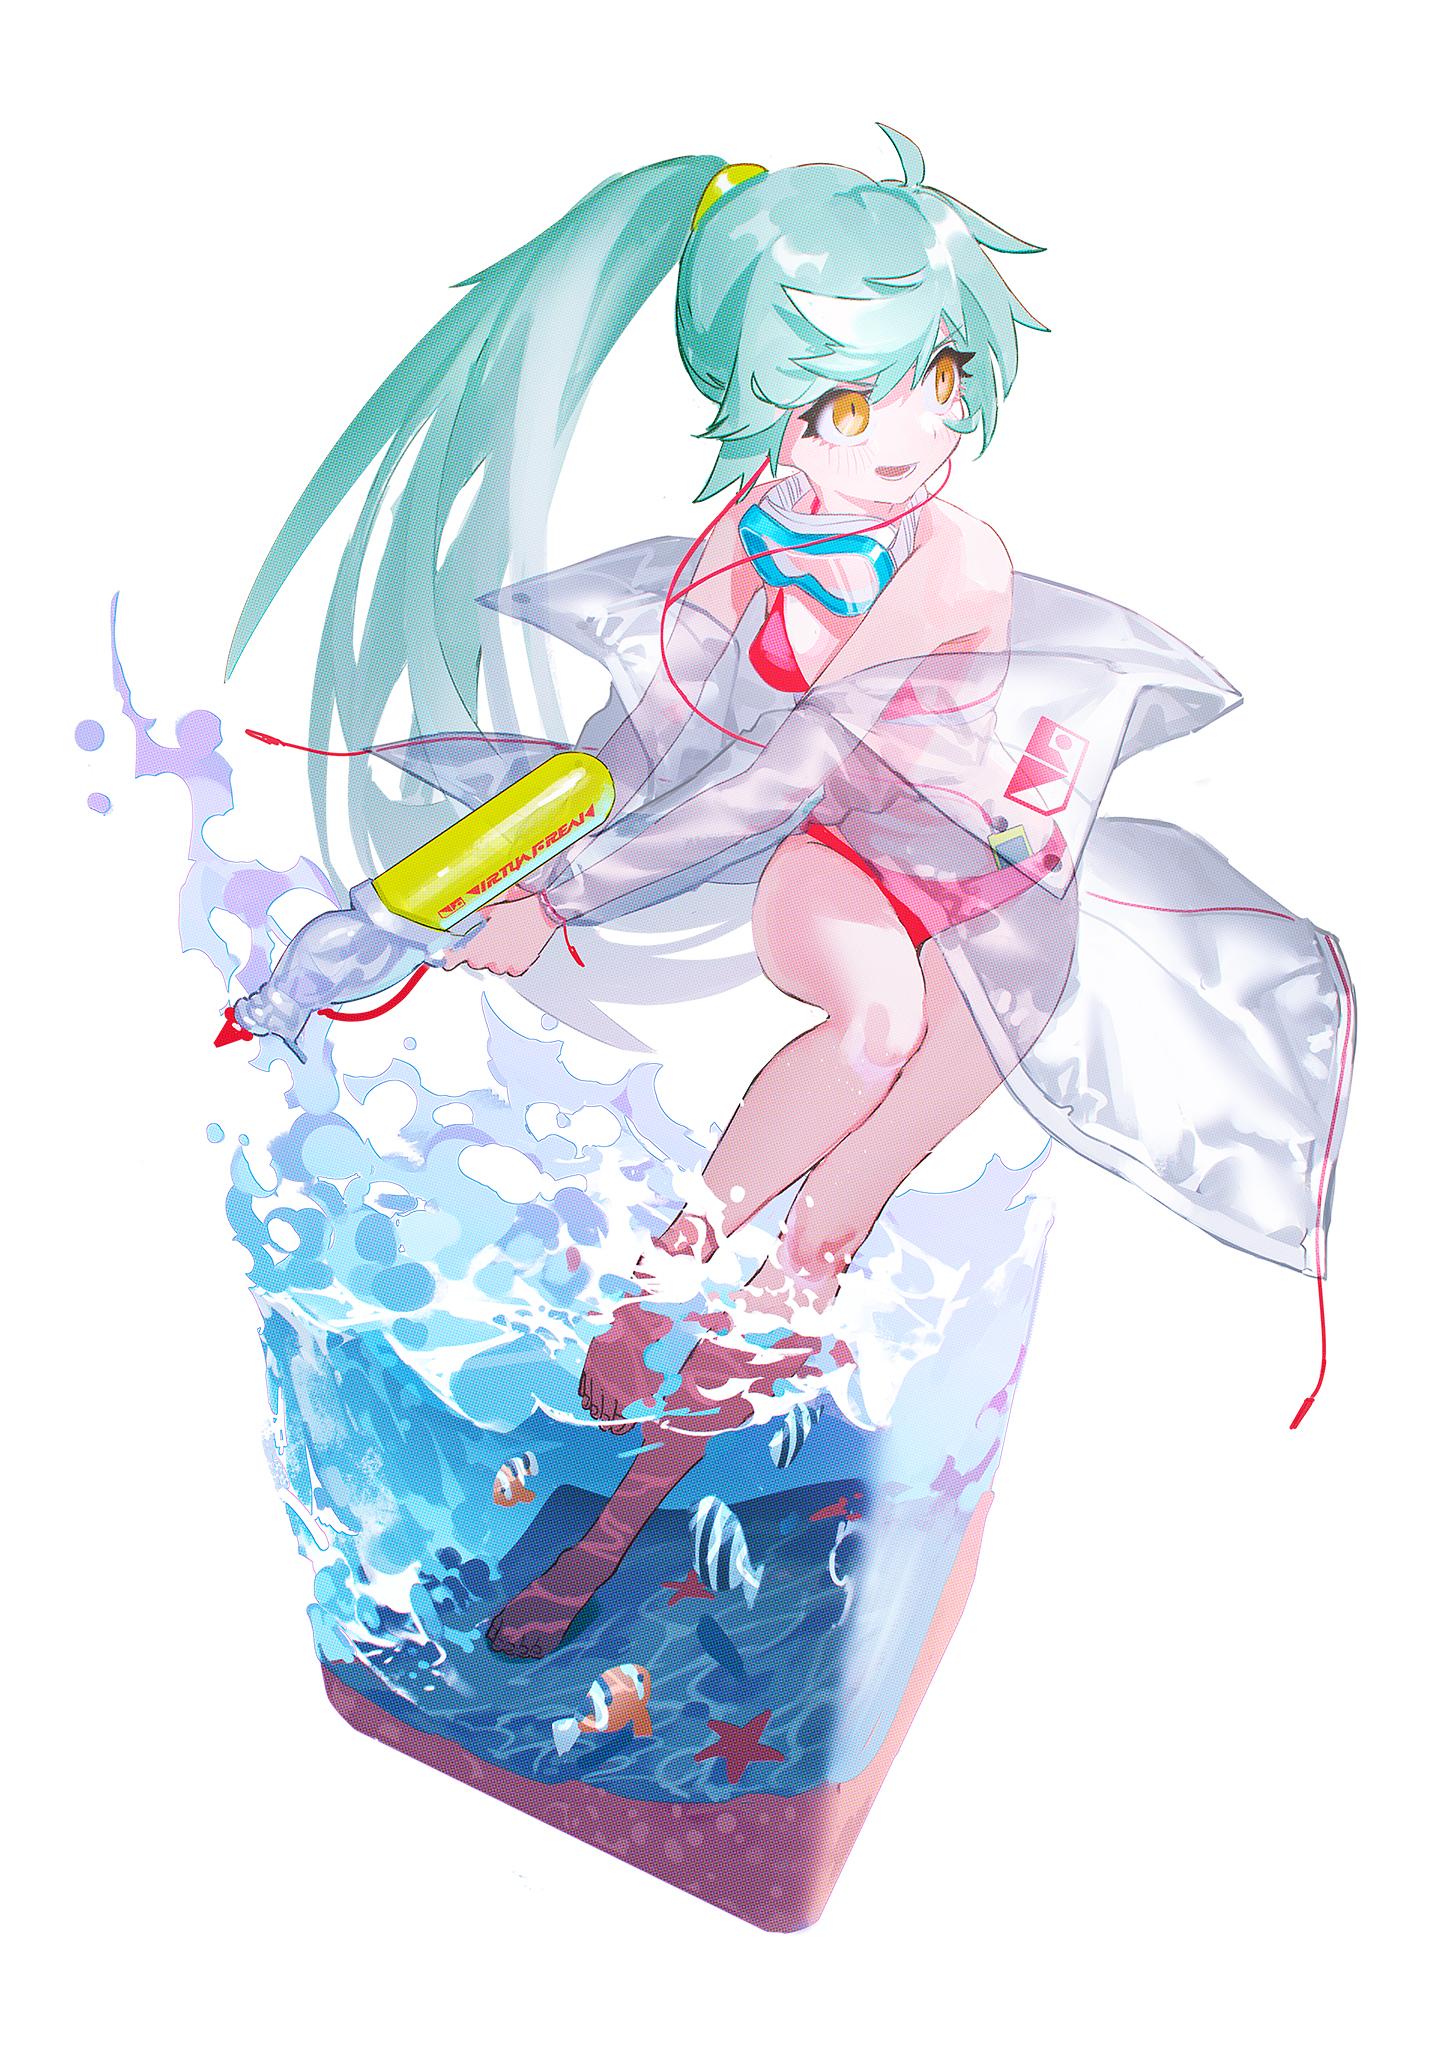 【P站画师】日本画师れおえん的插画作品- ACG17.COM